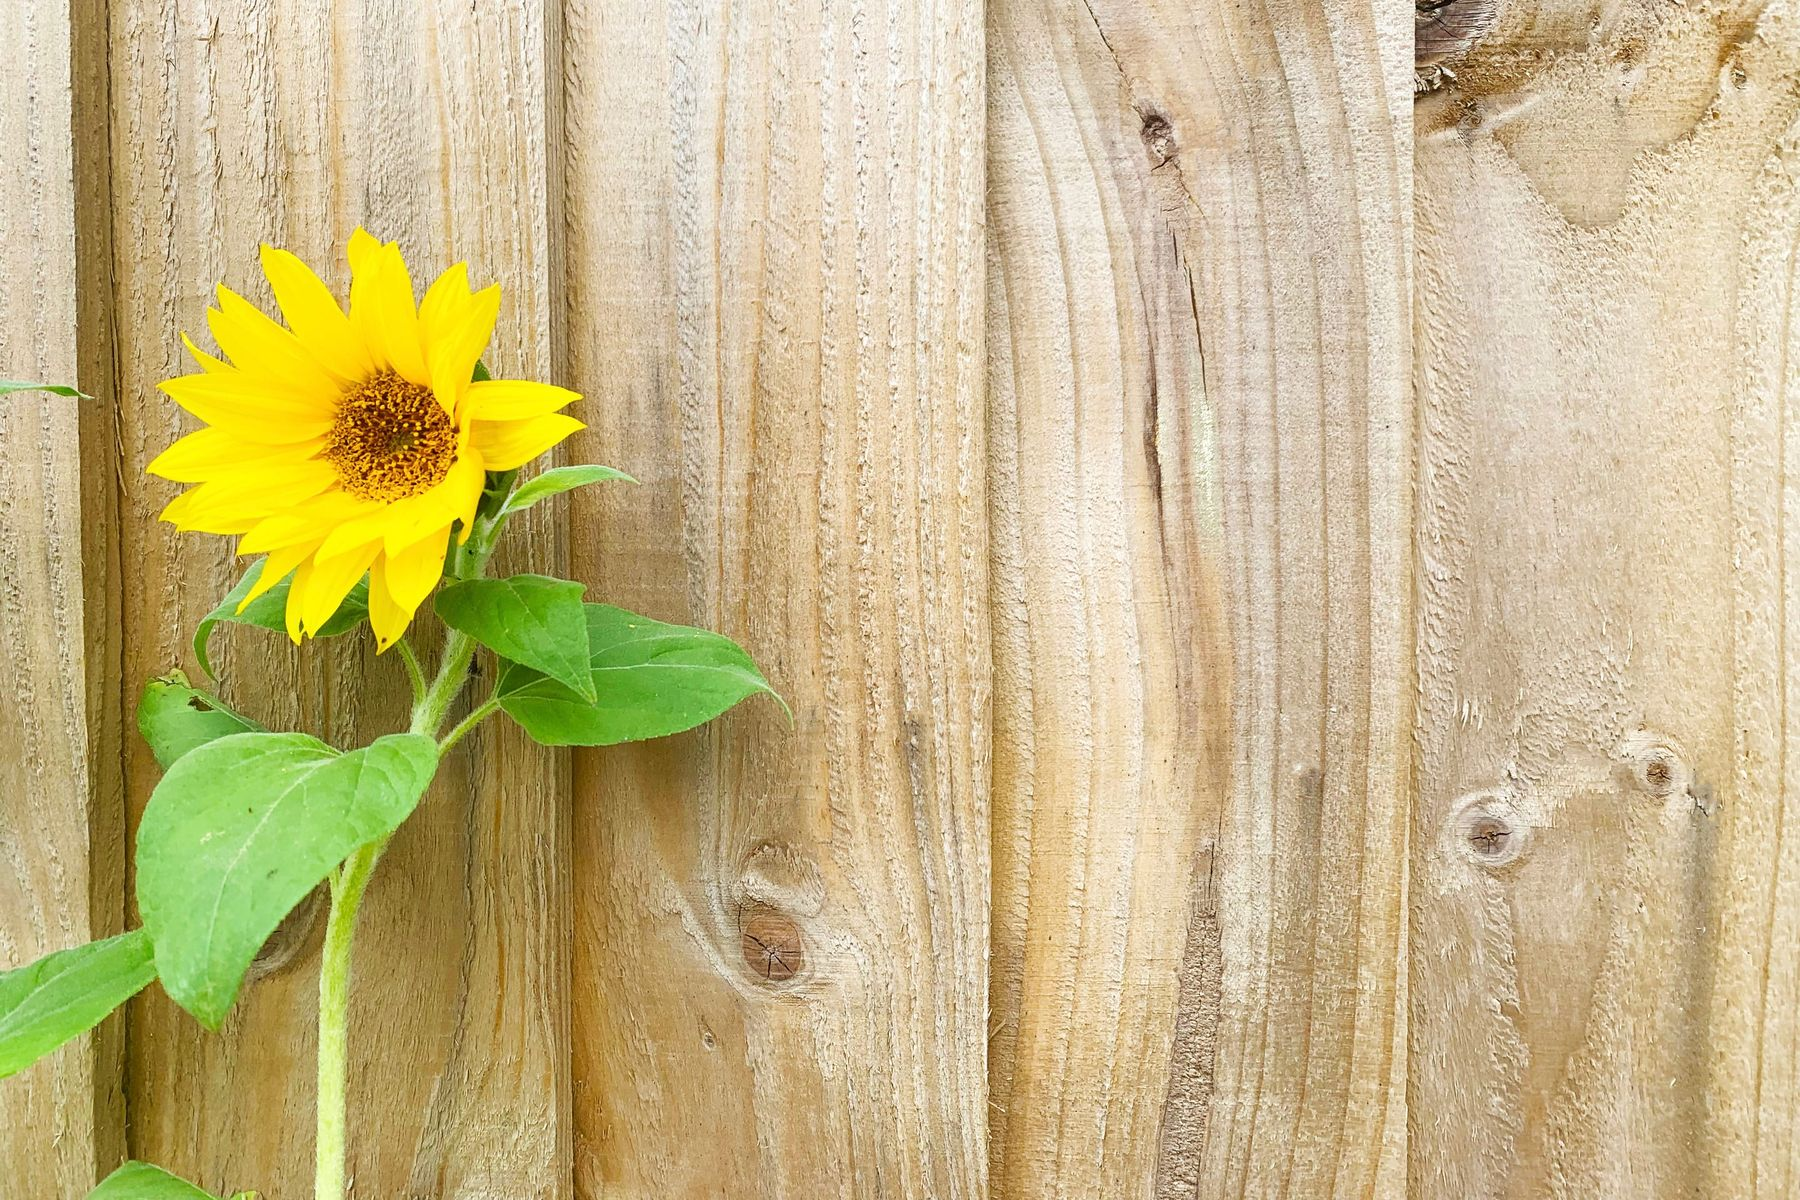 Sonnenblume vor Holzwand